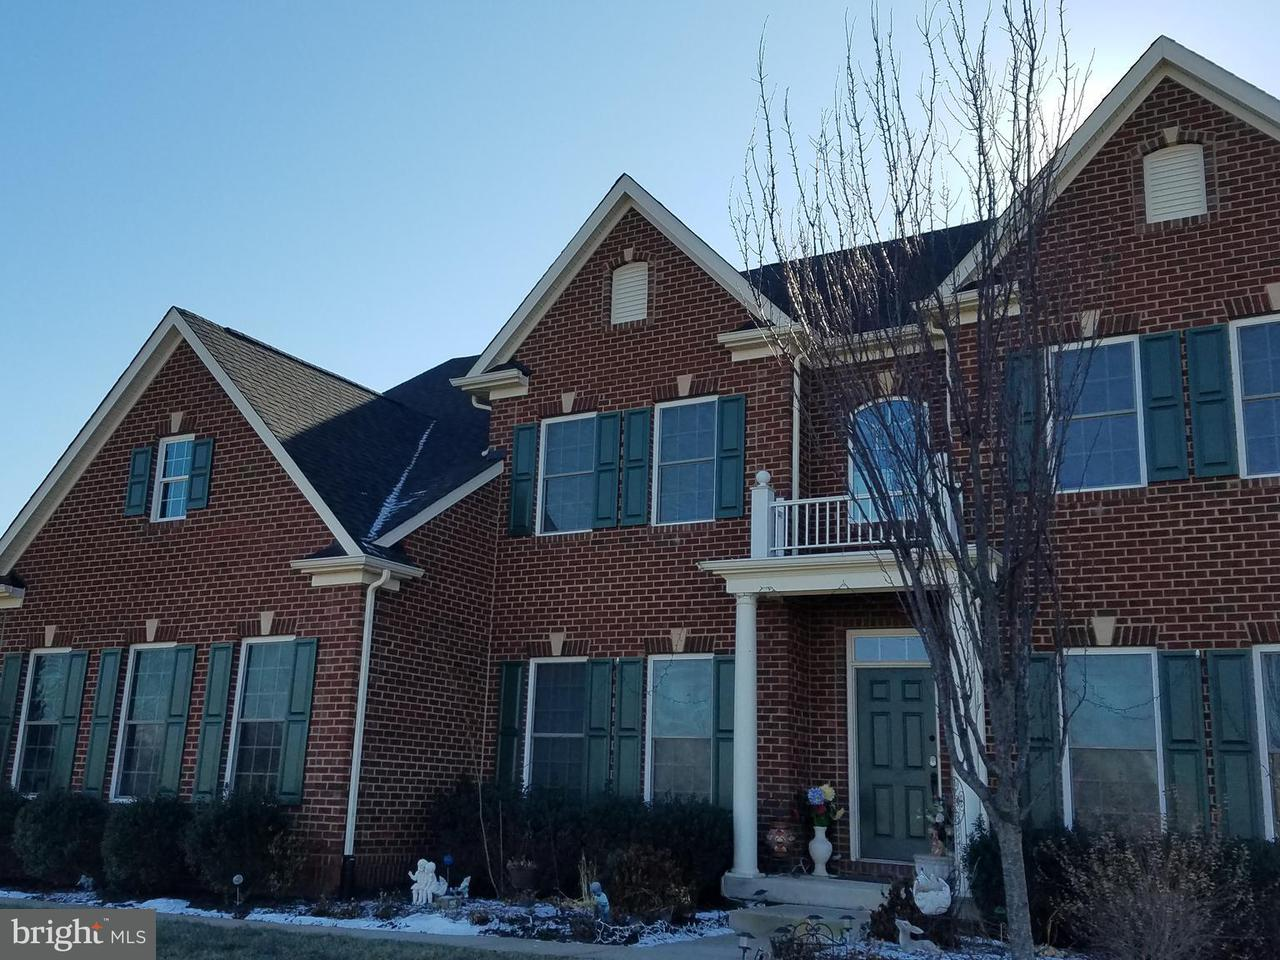 Single Family Home for Sale at 44420 Stone Roses Cir E 44420 Stone Roses Cir E Ashburn, Virginia 20147 United States